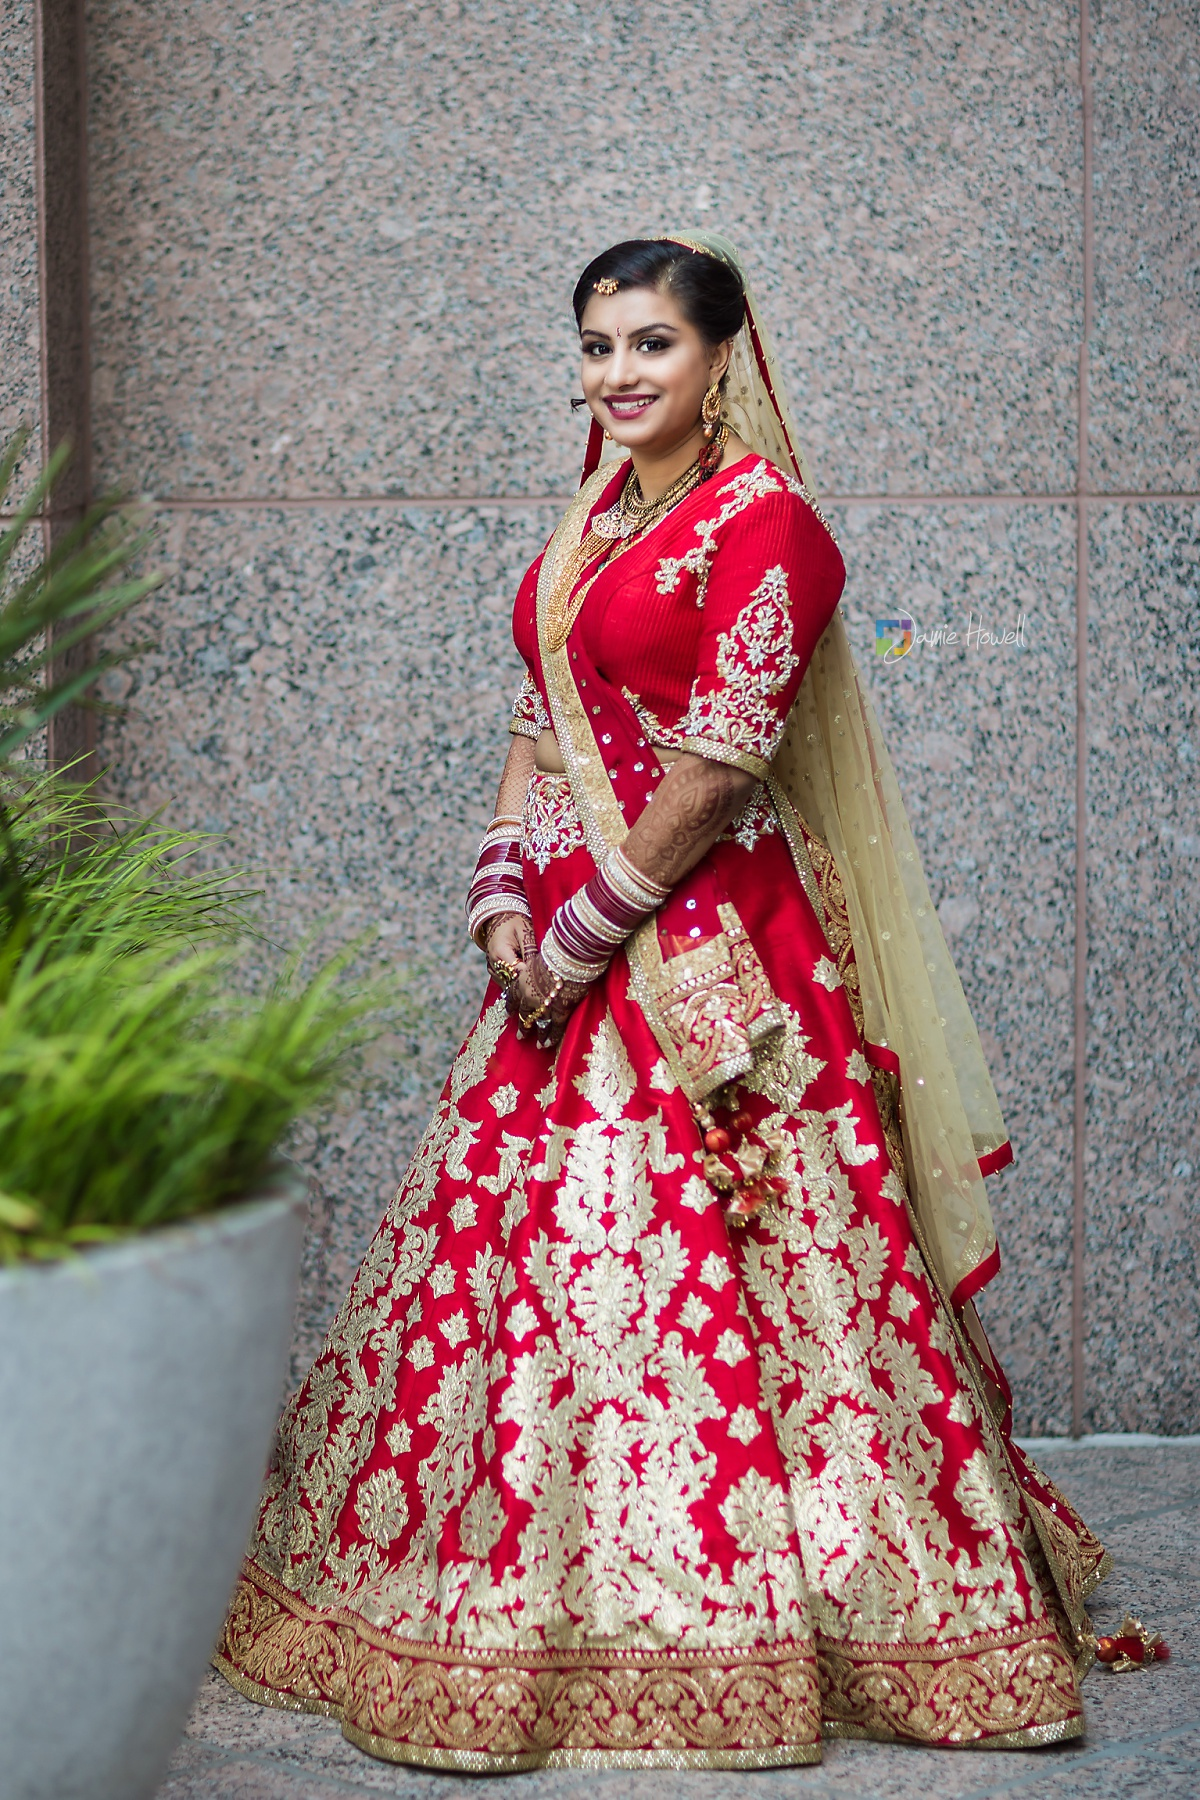 Hilton Charlotte Center South Asian Wedding (46)